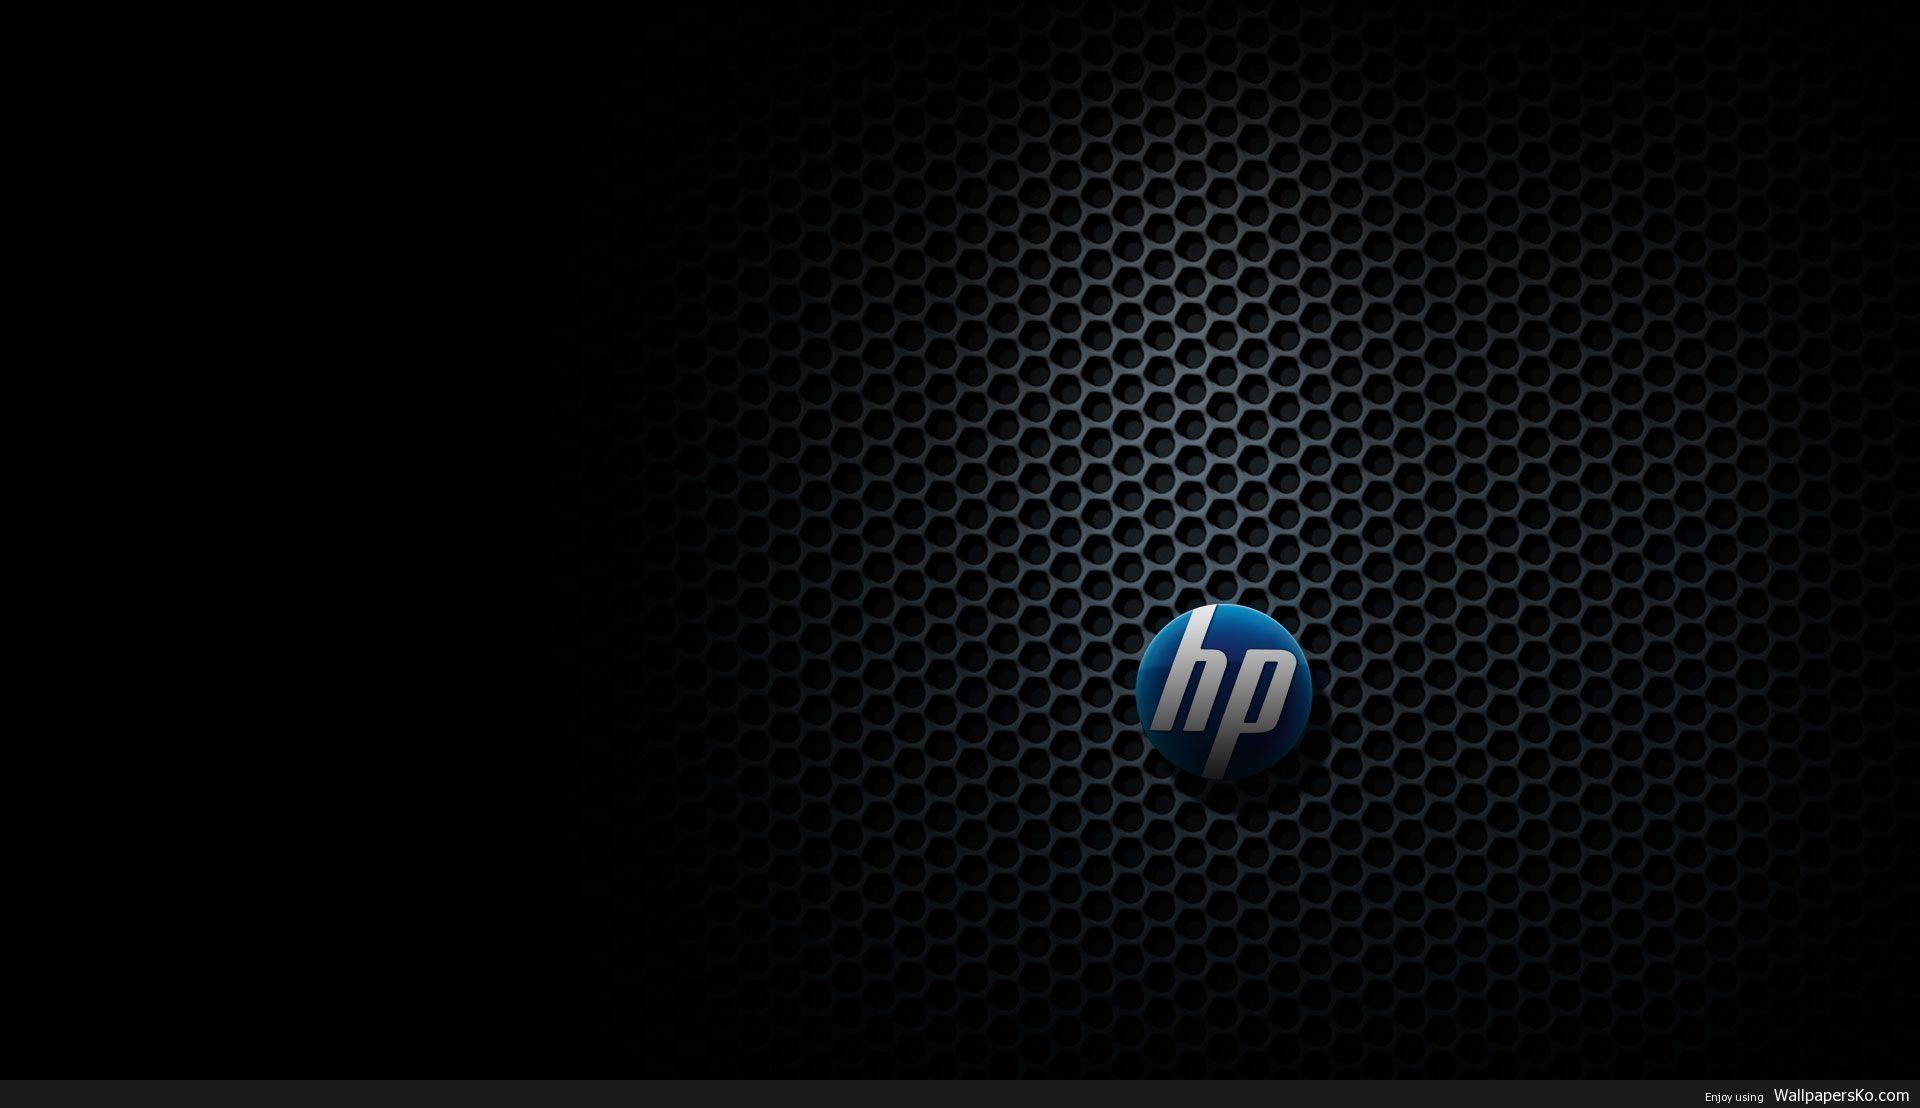 Hp Laptop Background Http Wallpapersko Com Hp Laptop Background Html Hd Wallpapers Download Hp Laptop Hd Wallpaper Desktop Laptop Wallpaper